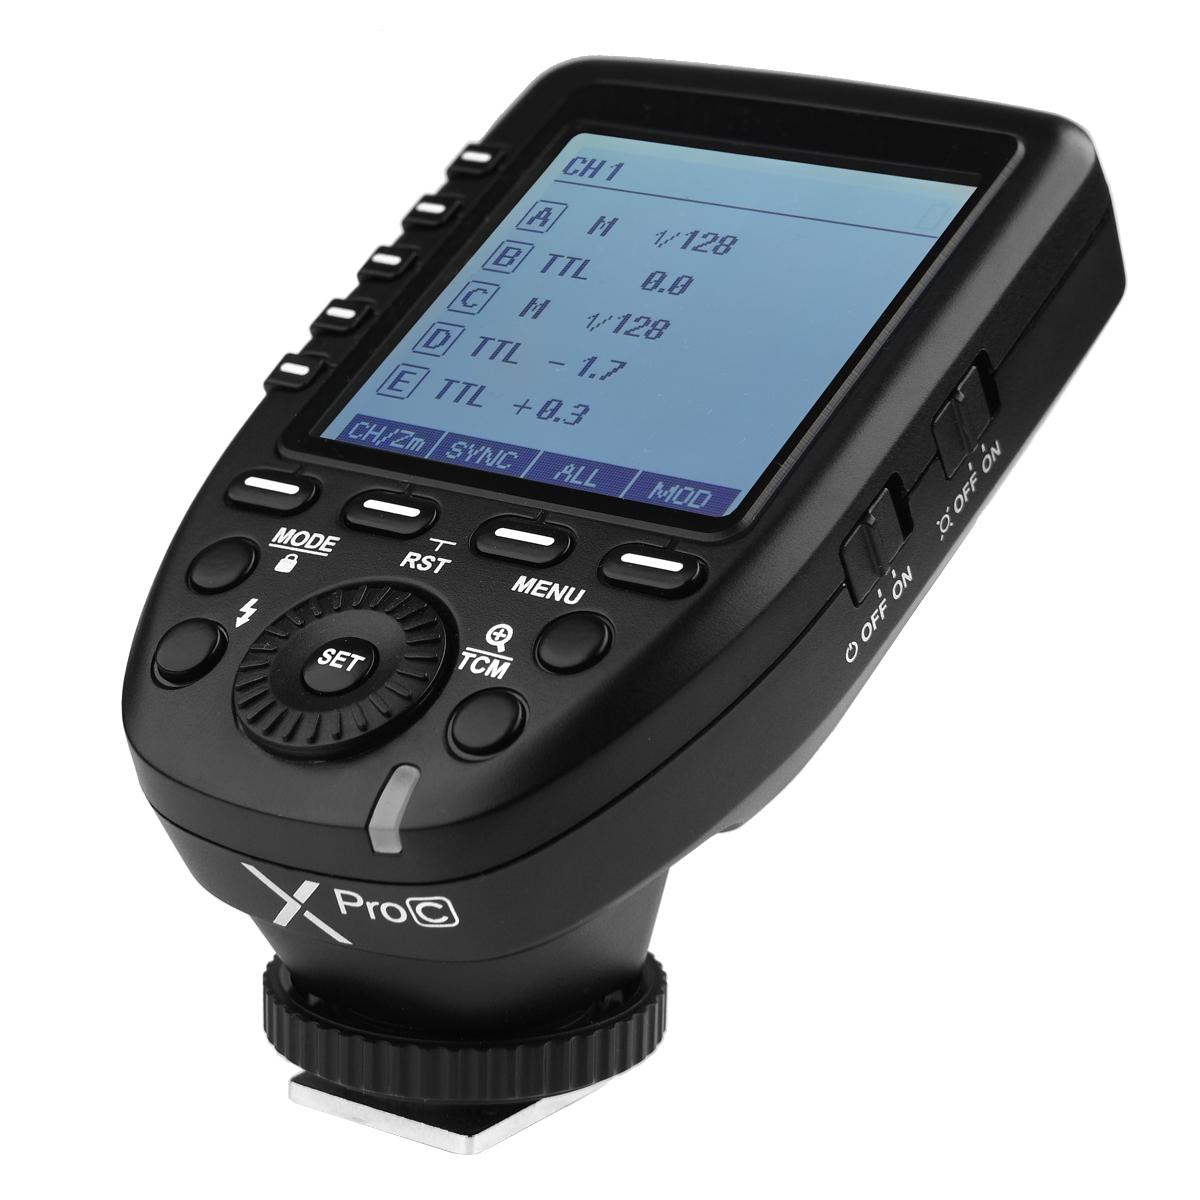 GODOX ゴドックス X Pro C キャノン用 ワイヤレスフラッシュ 外付けフラッシュ